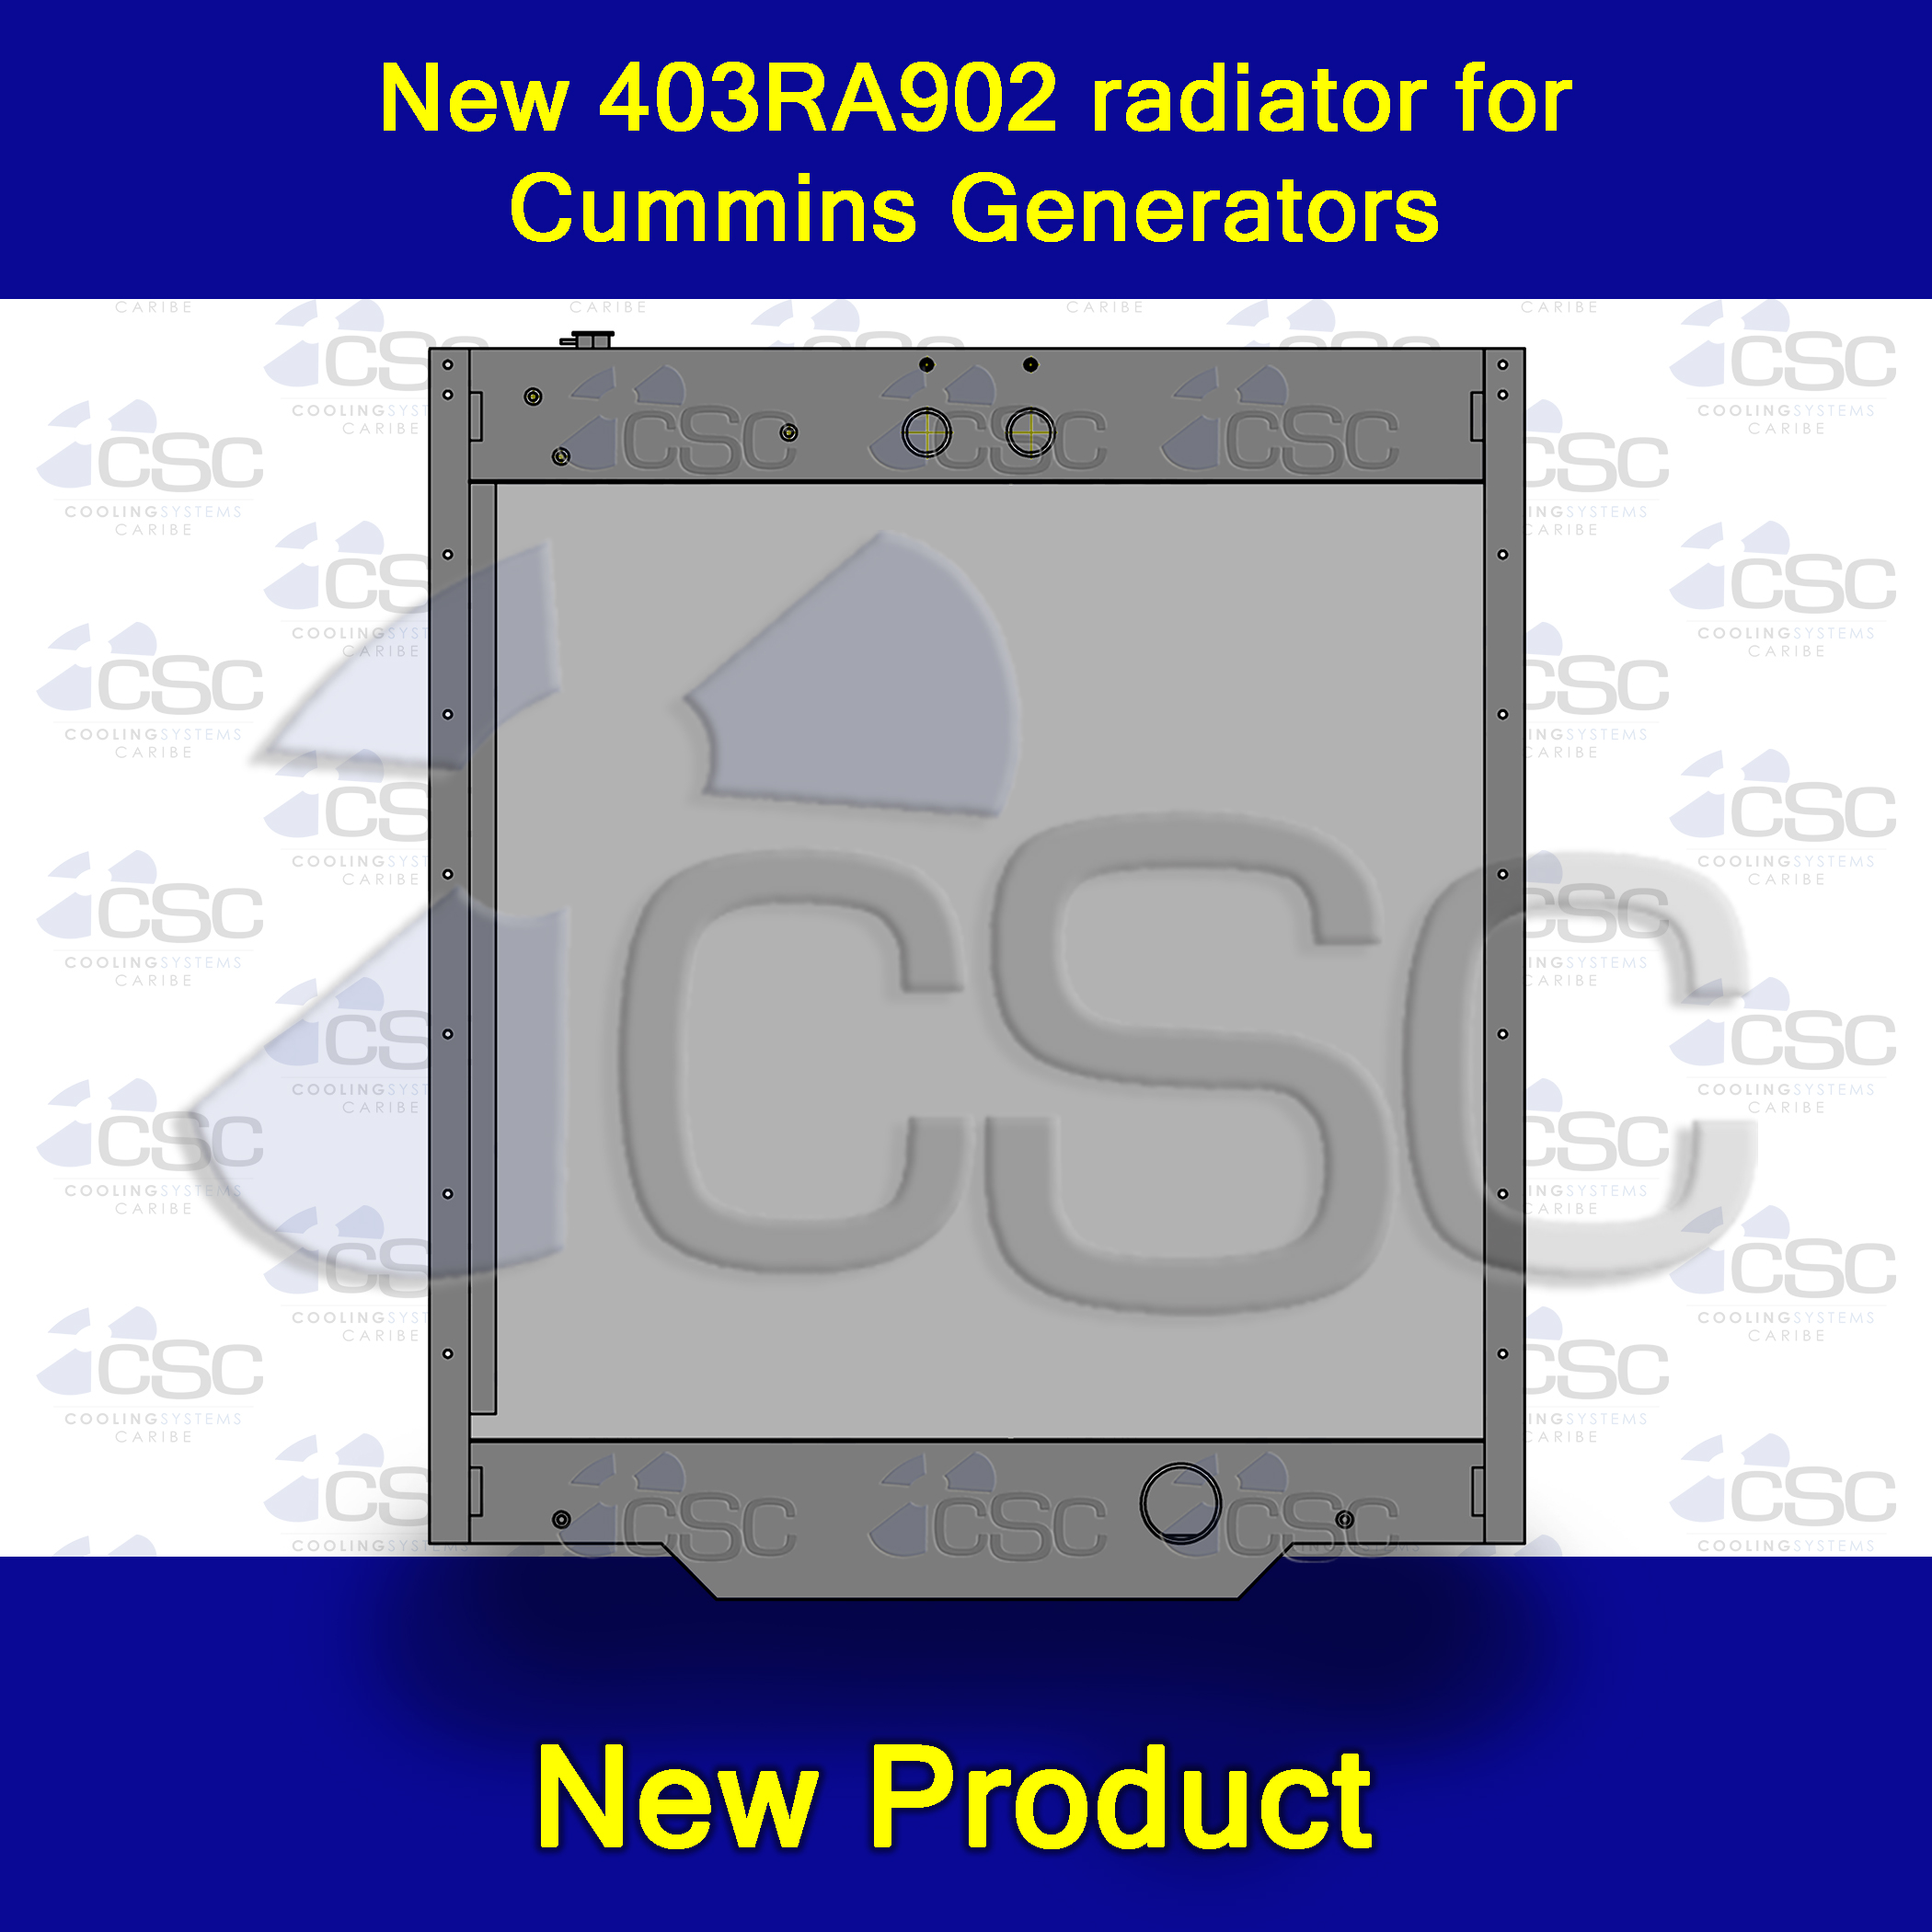 New 403RA902 radiator for Cummins powered generators